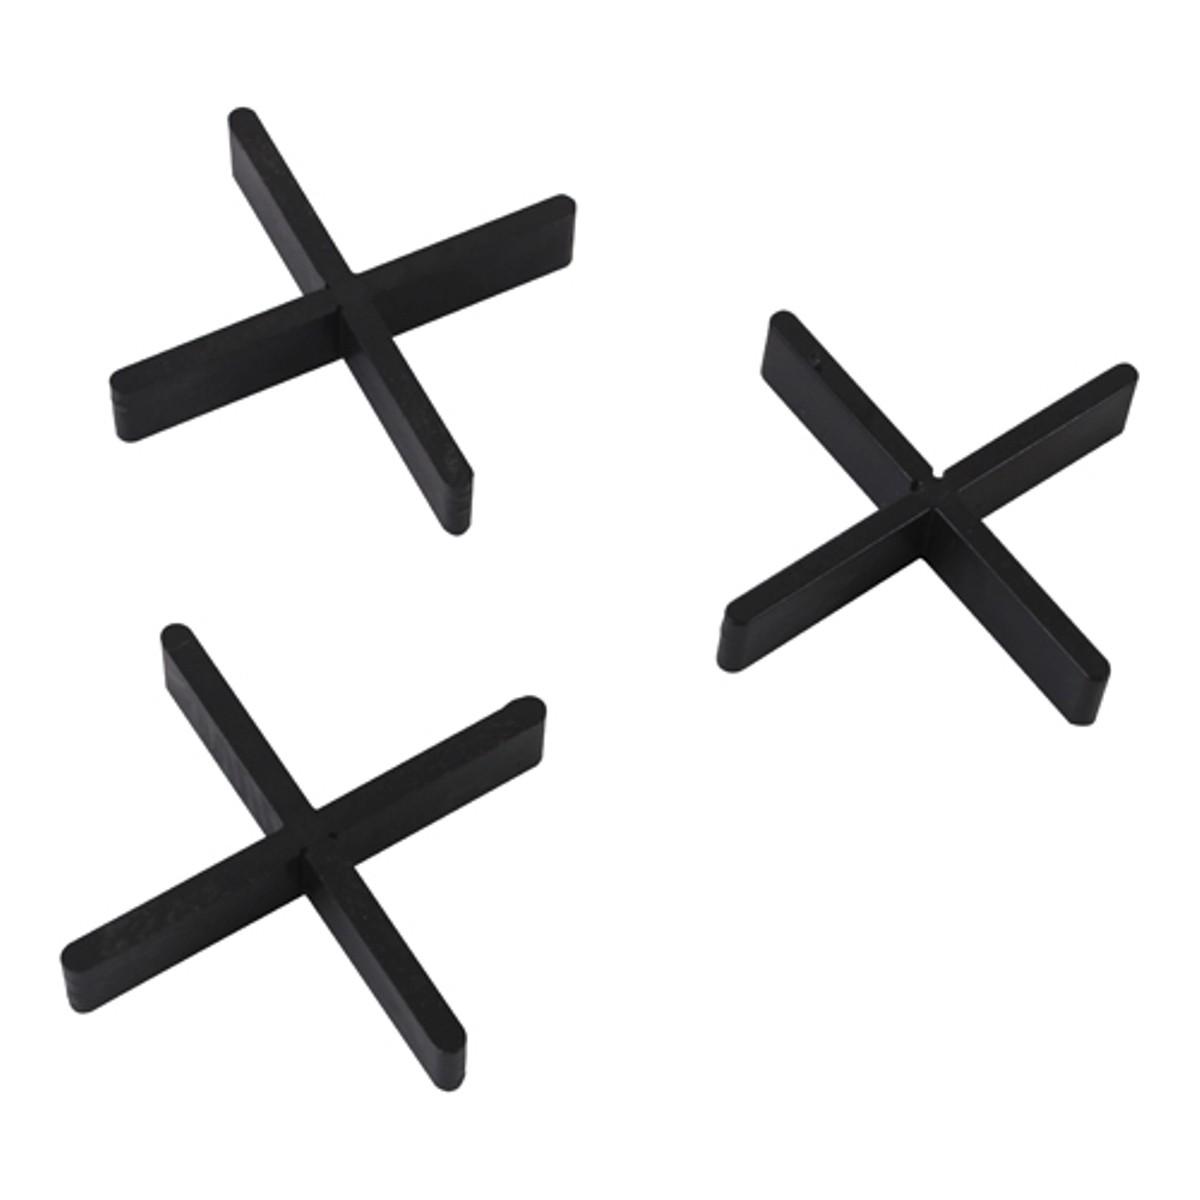 Voegkruis afbreekbaar zwart 5mm 10x55mm (100st.)